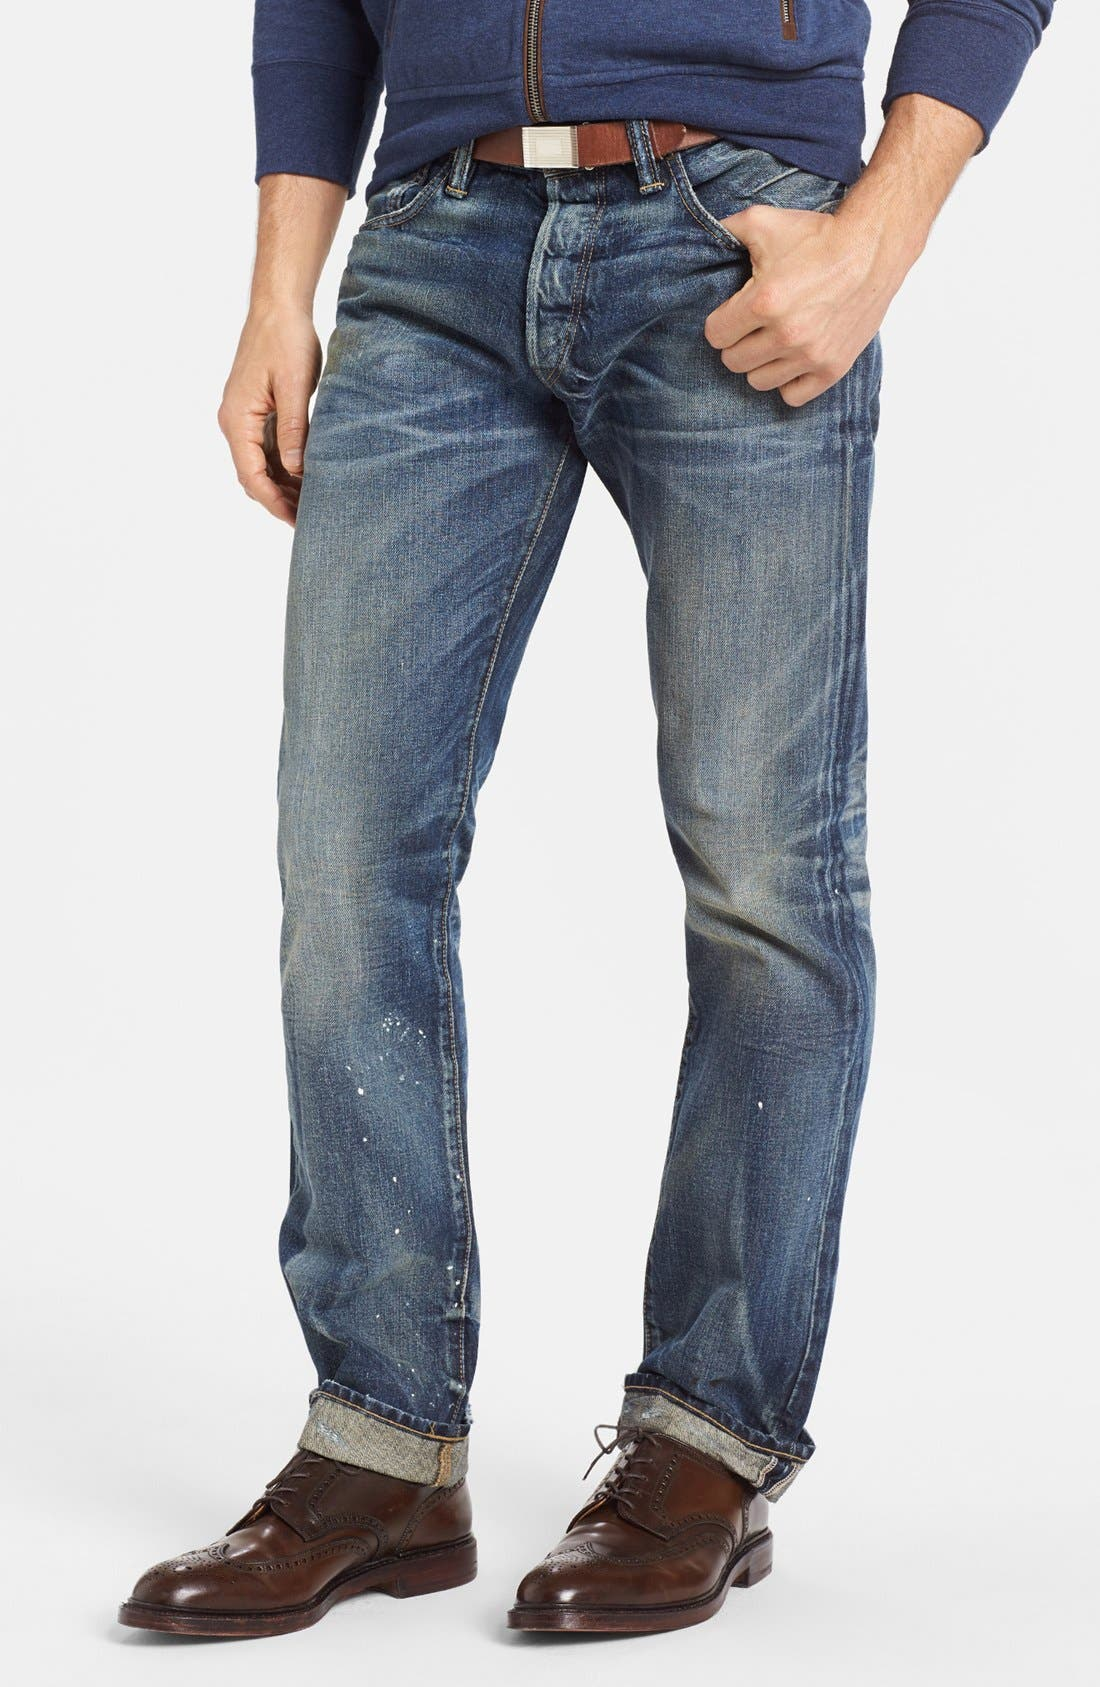 Main Image - Polo Ralph Lauren Slim Fit Jeans (Linden Rinse)